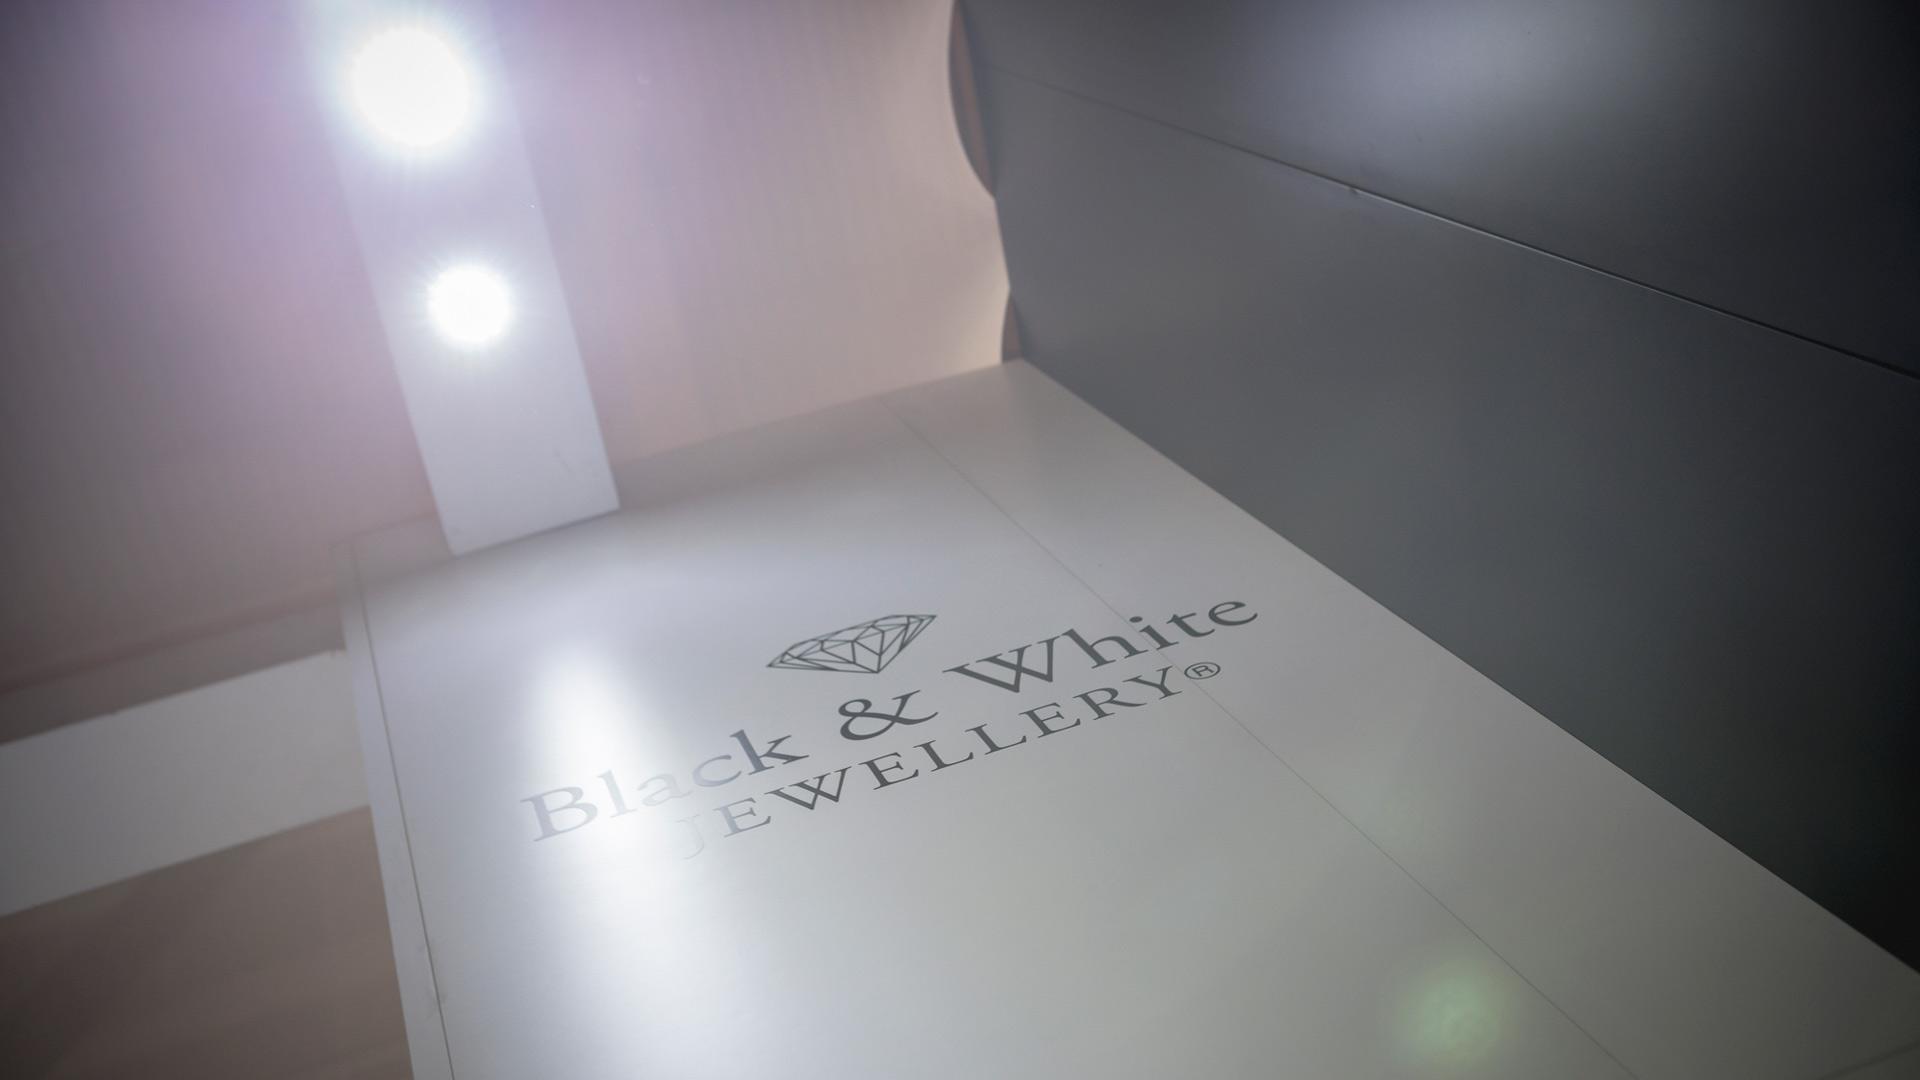 Allestimenti fieristici fiera VicenzaOro stand Black & White | Foster Allestimenti 08